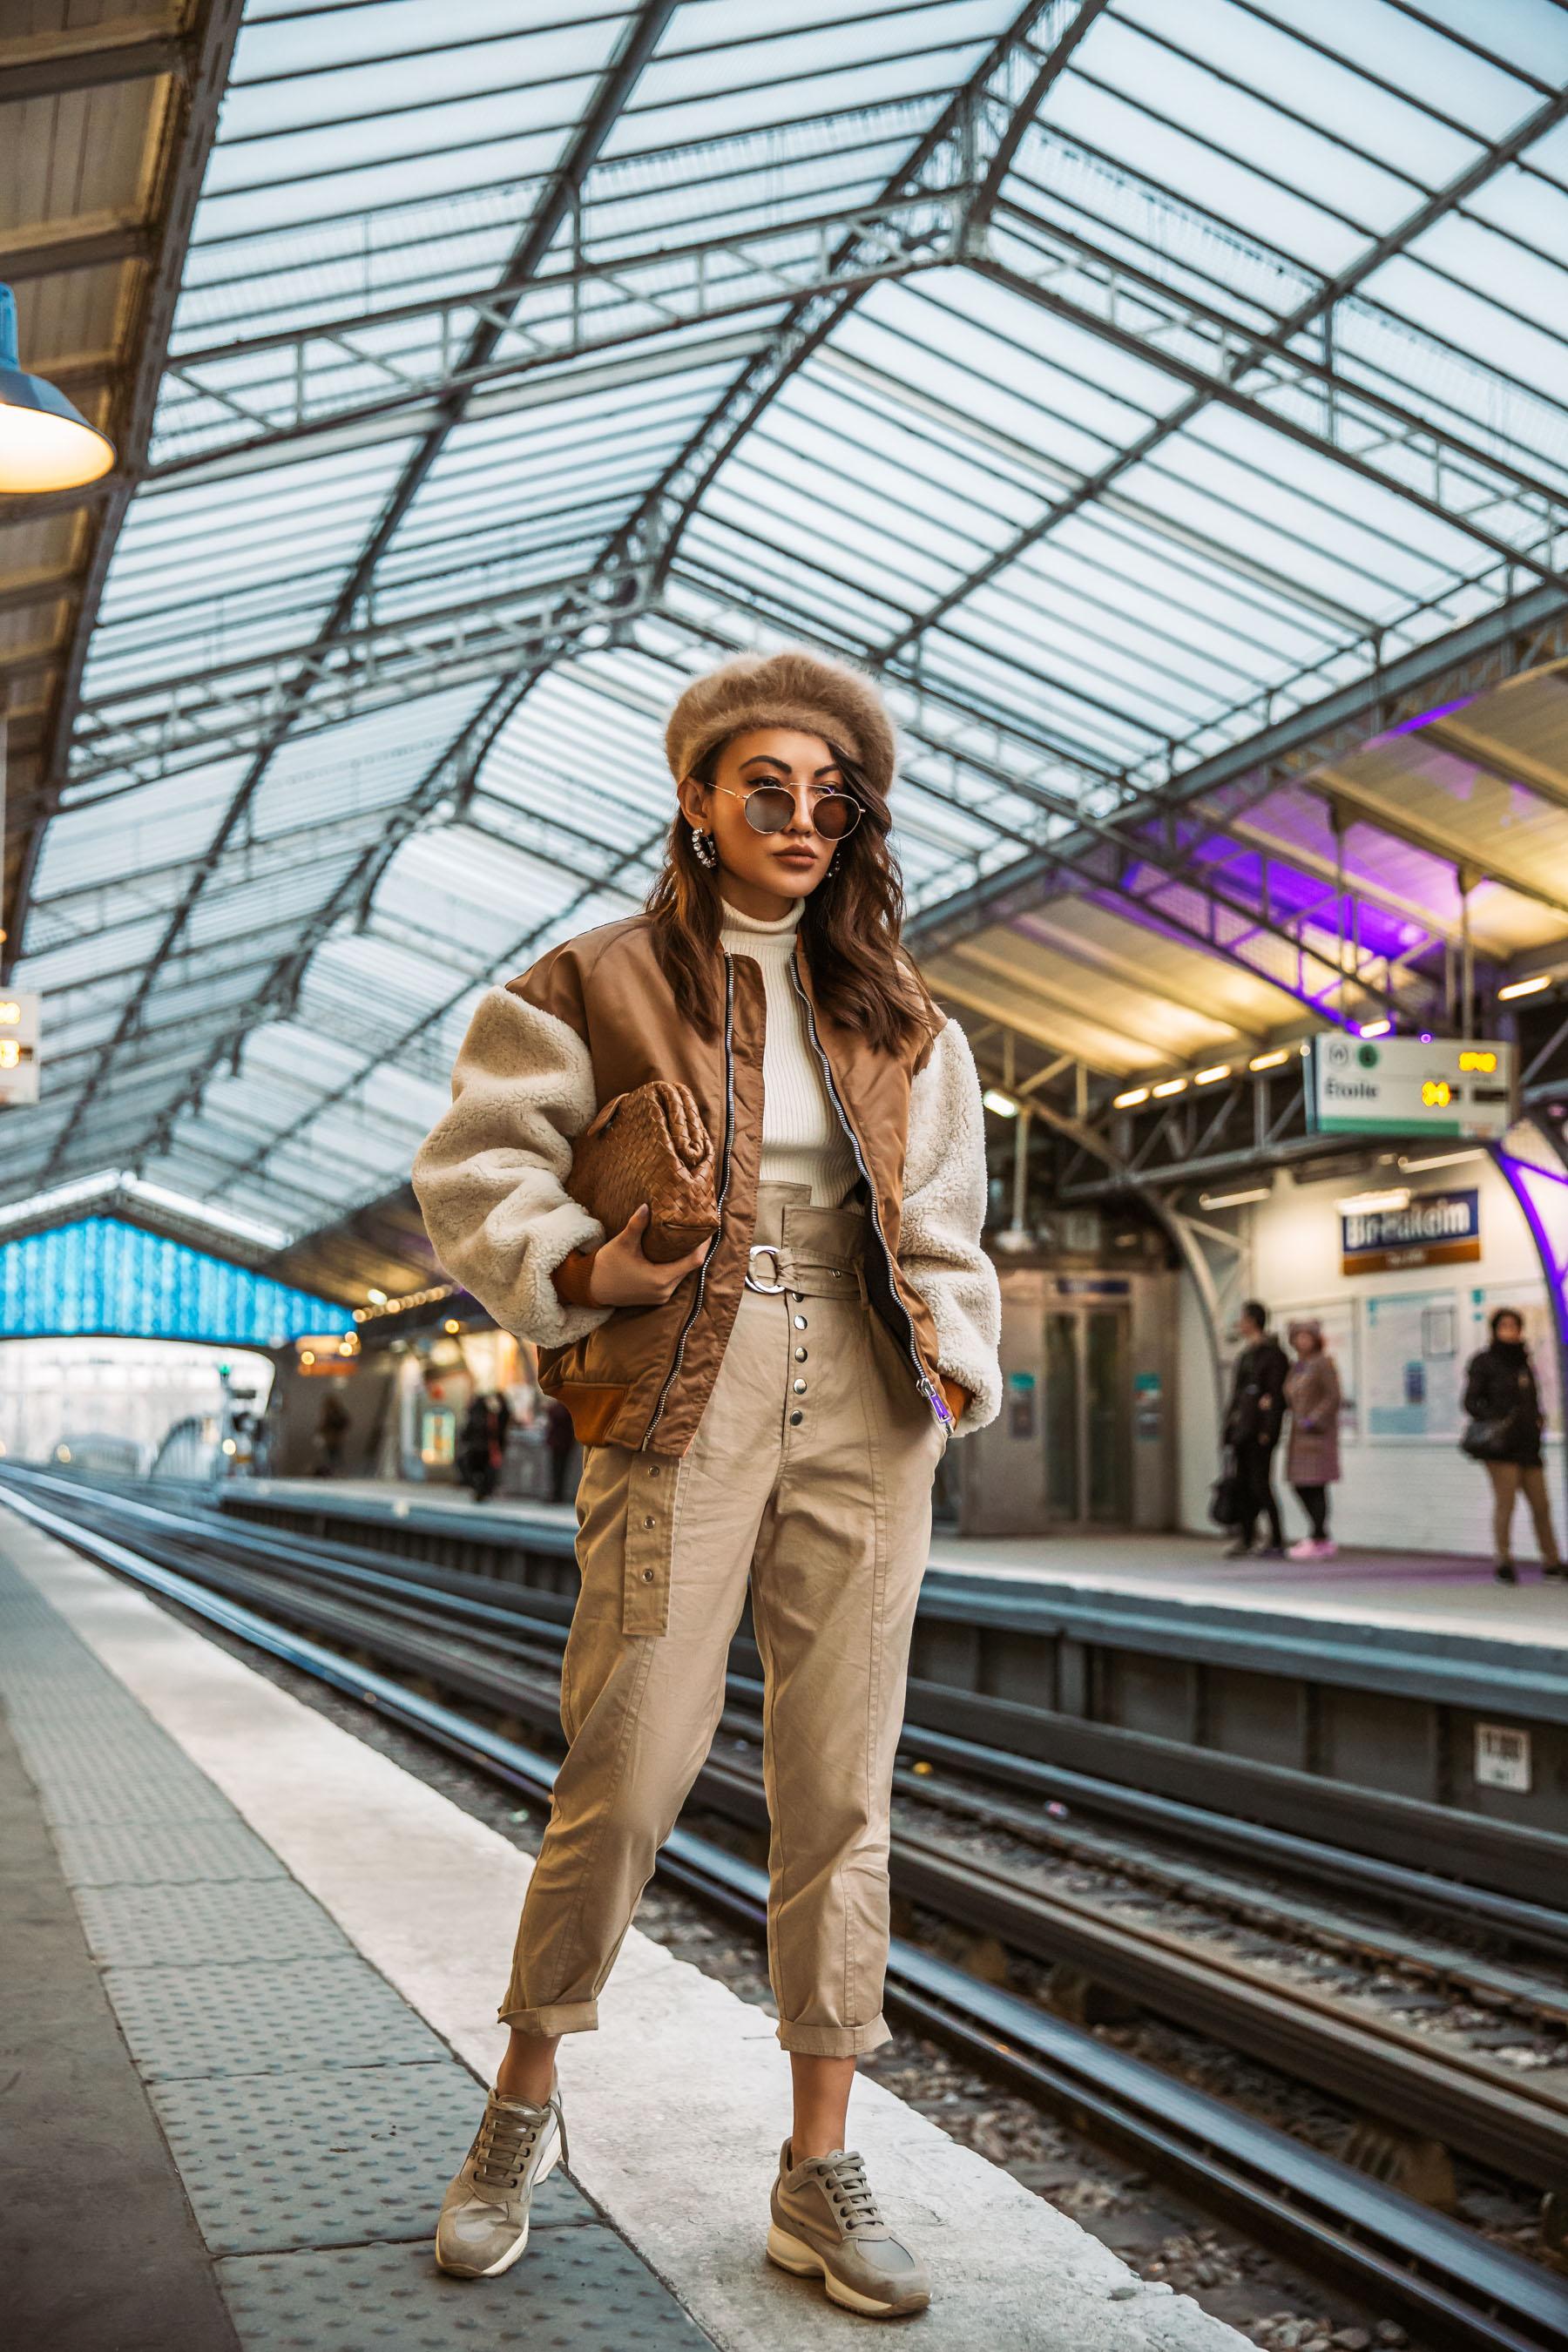 investment pieces, bottega vaneta clutch, fall 2019 fashion // Notjessfashion.com